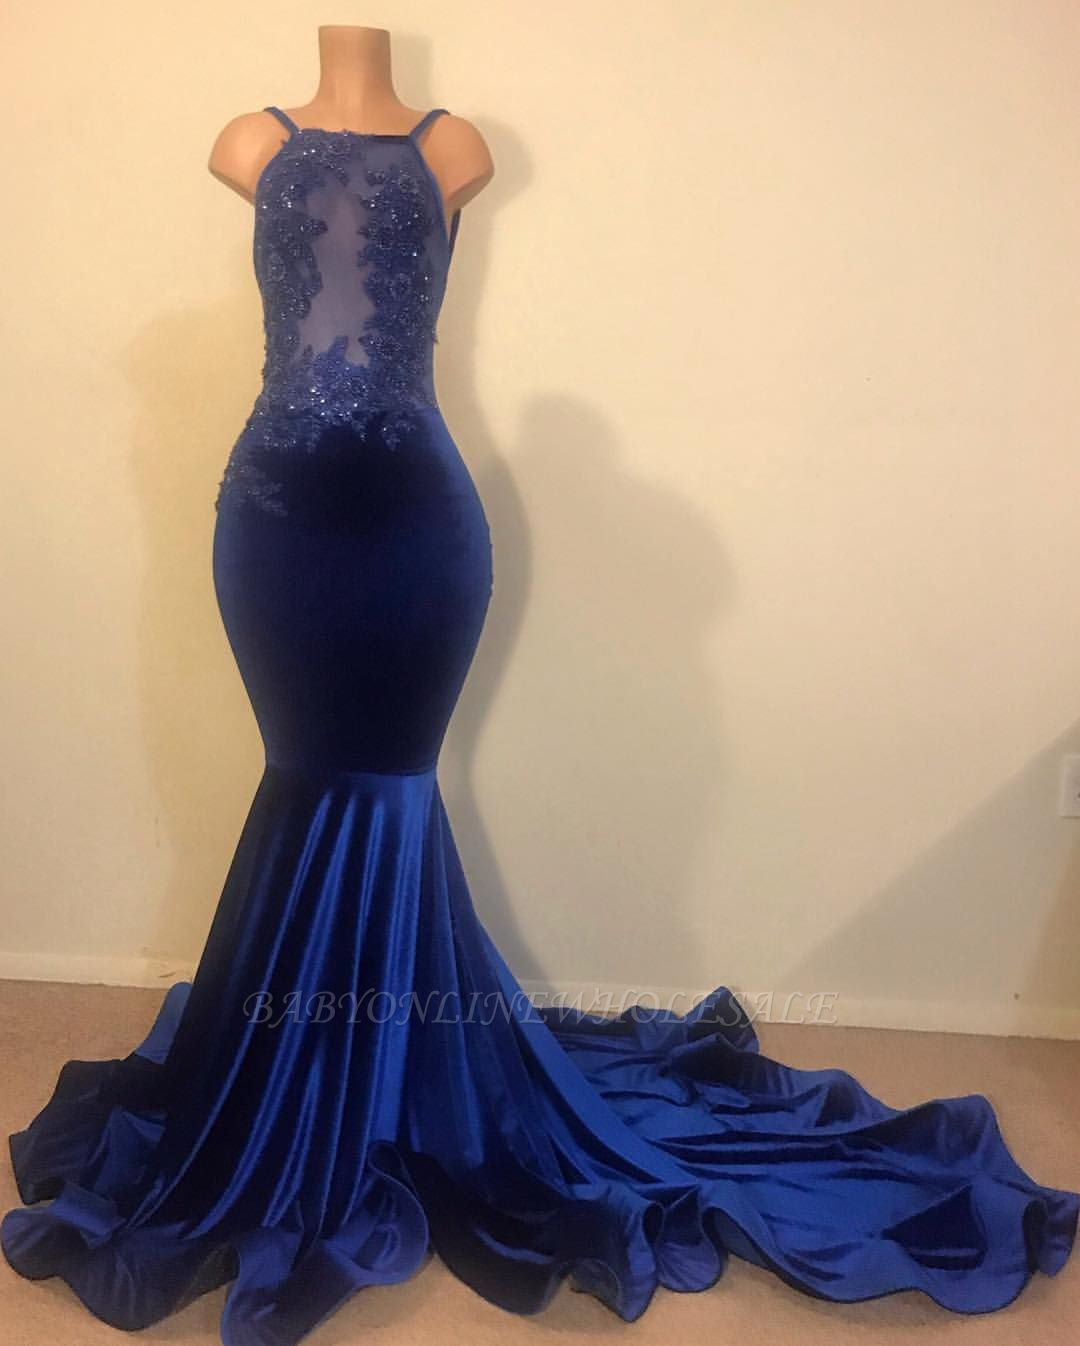 Sexy Mermaid Spahgetti-Straps Openback Velvet Applique Prom Dress